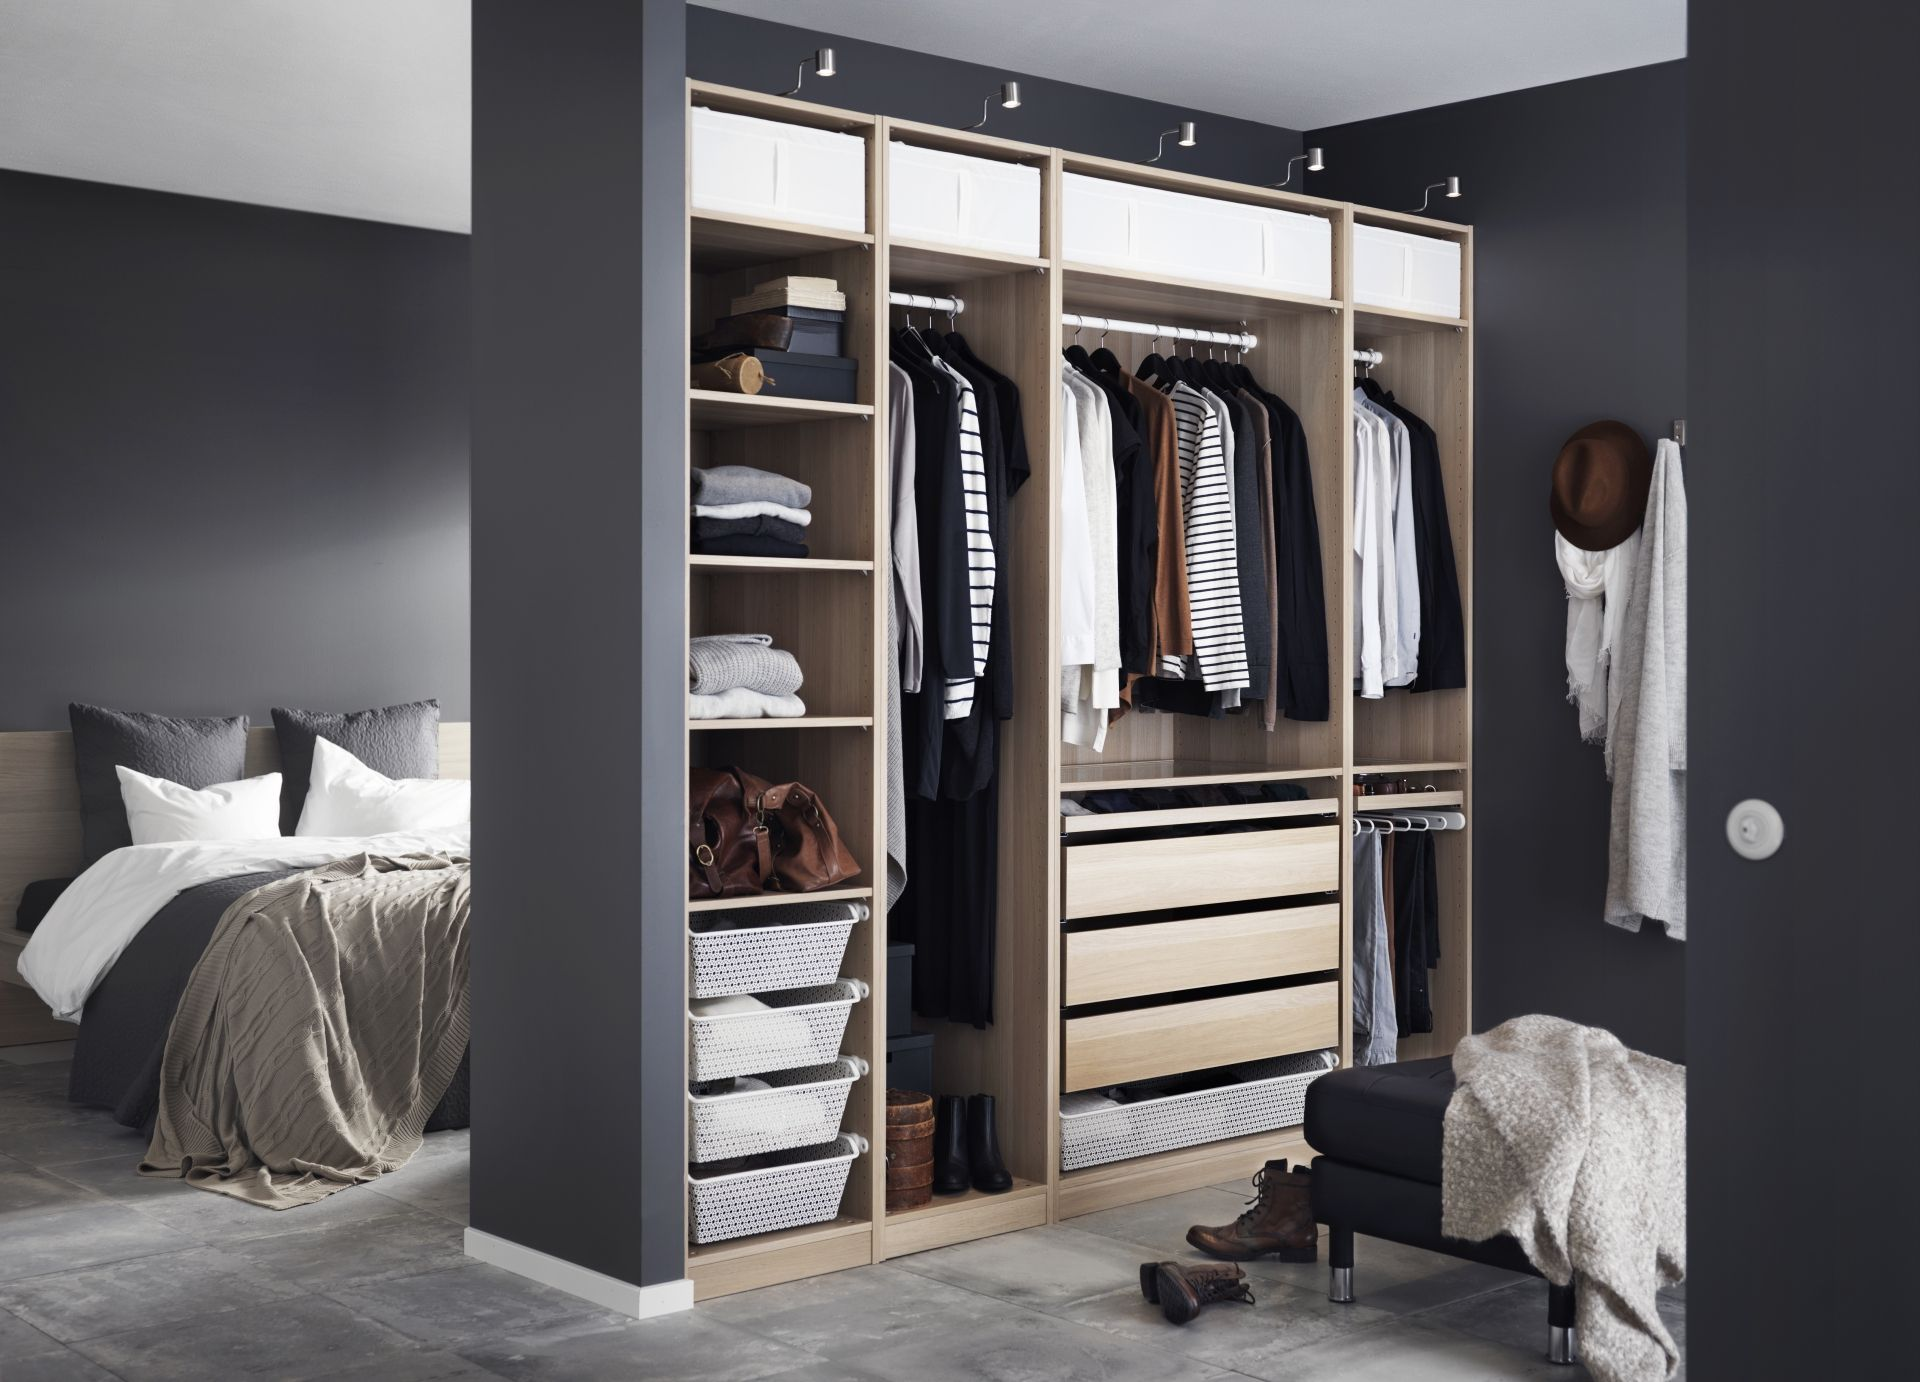 Ikea Kasten Slaapkamer : Pax garderobekast ikea ikeanl modulair systeem kast